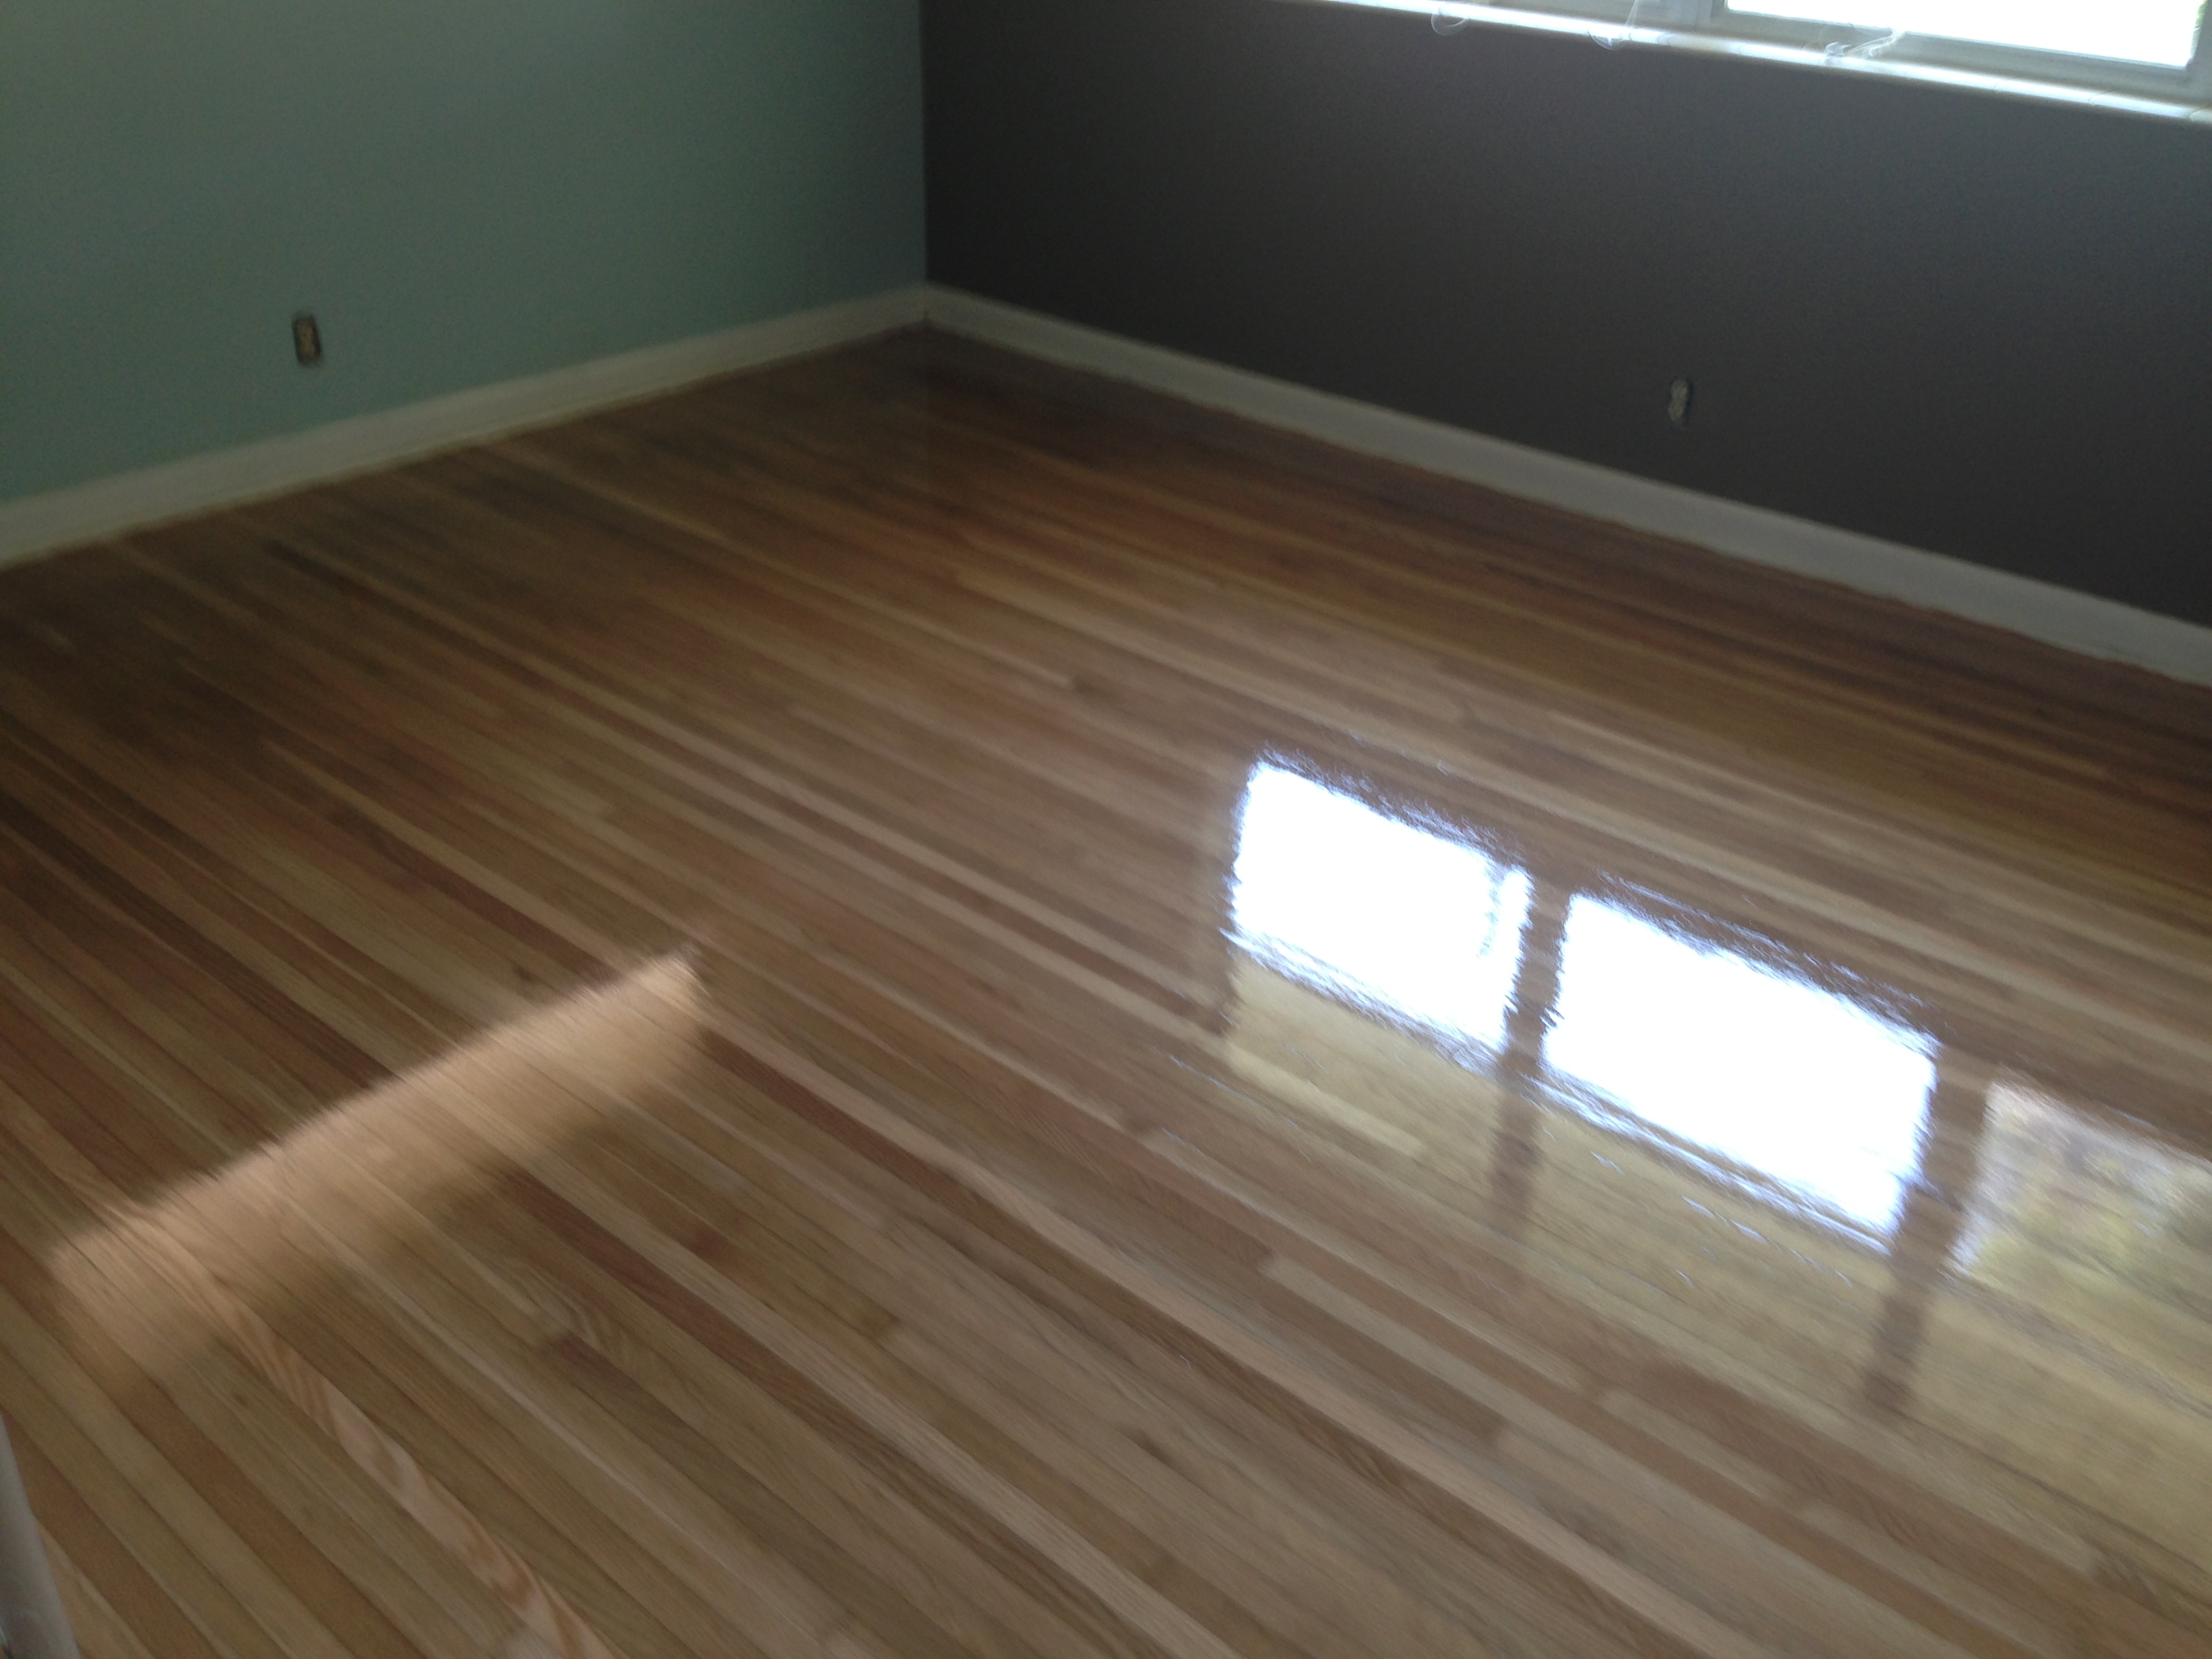 Solid wood flooring jacksonville ponte vedra st augustine fl for Flooring st augustine